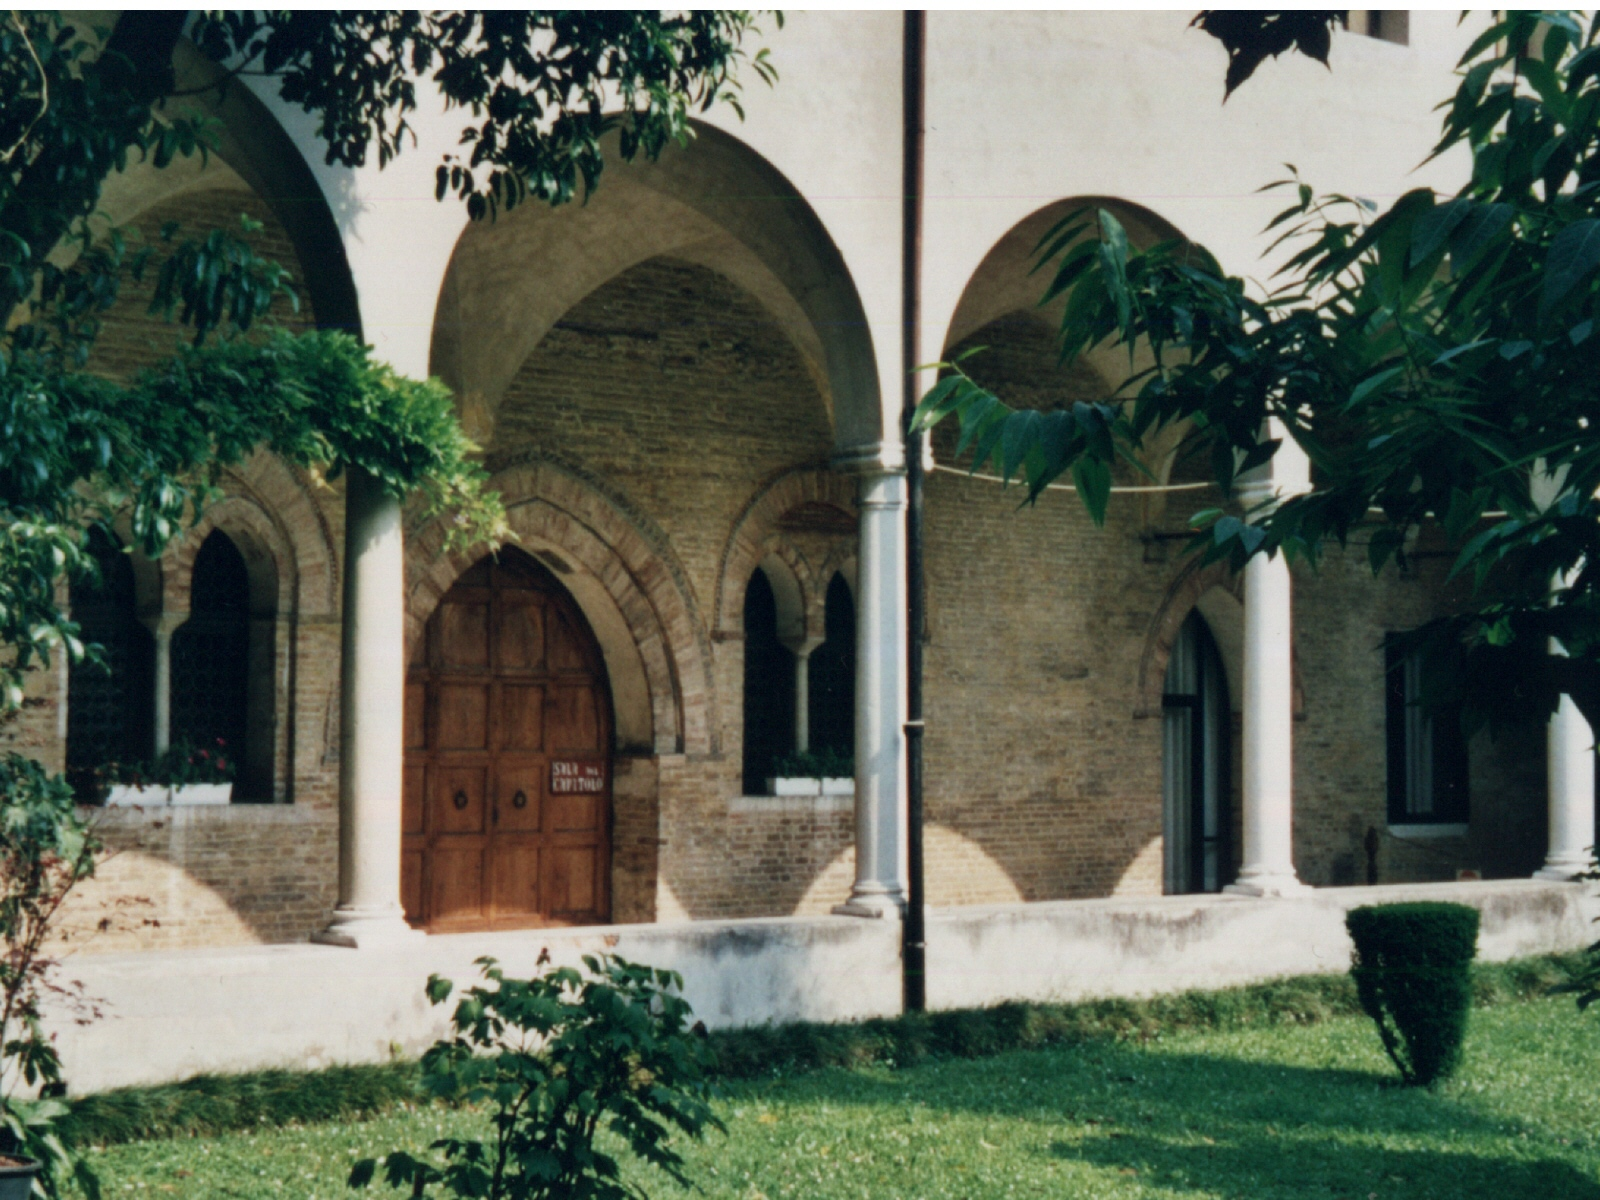 Kreuzgang im Kloster San Nicolo in Treviso